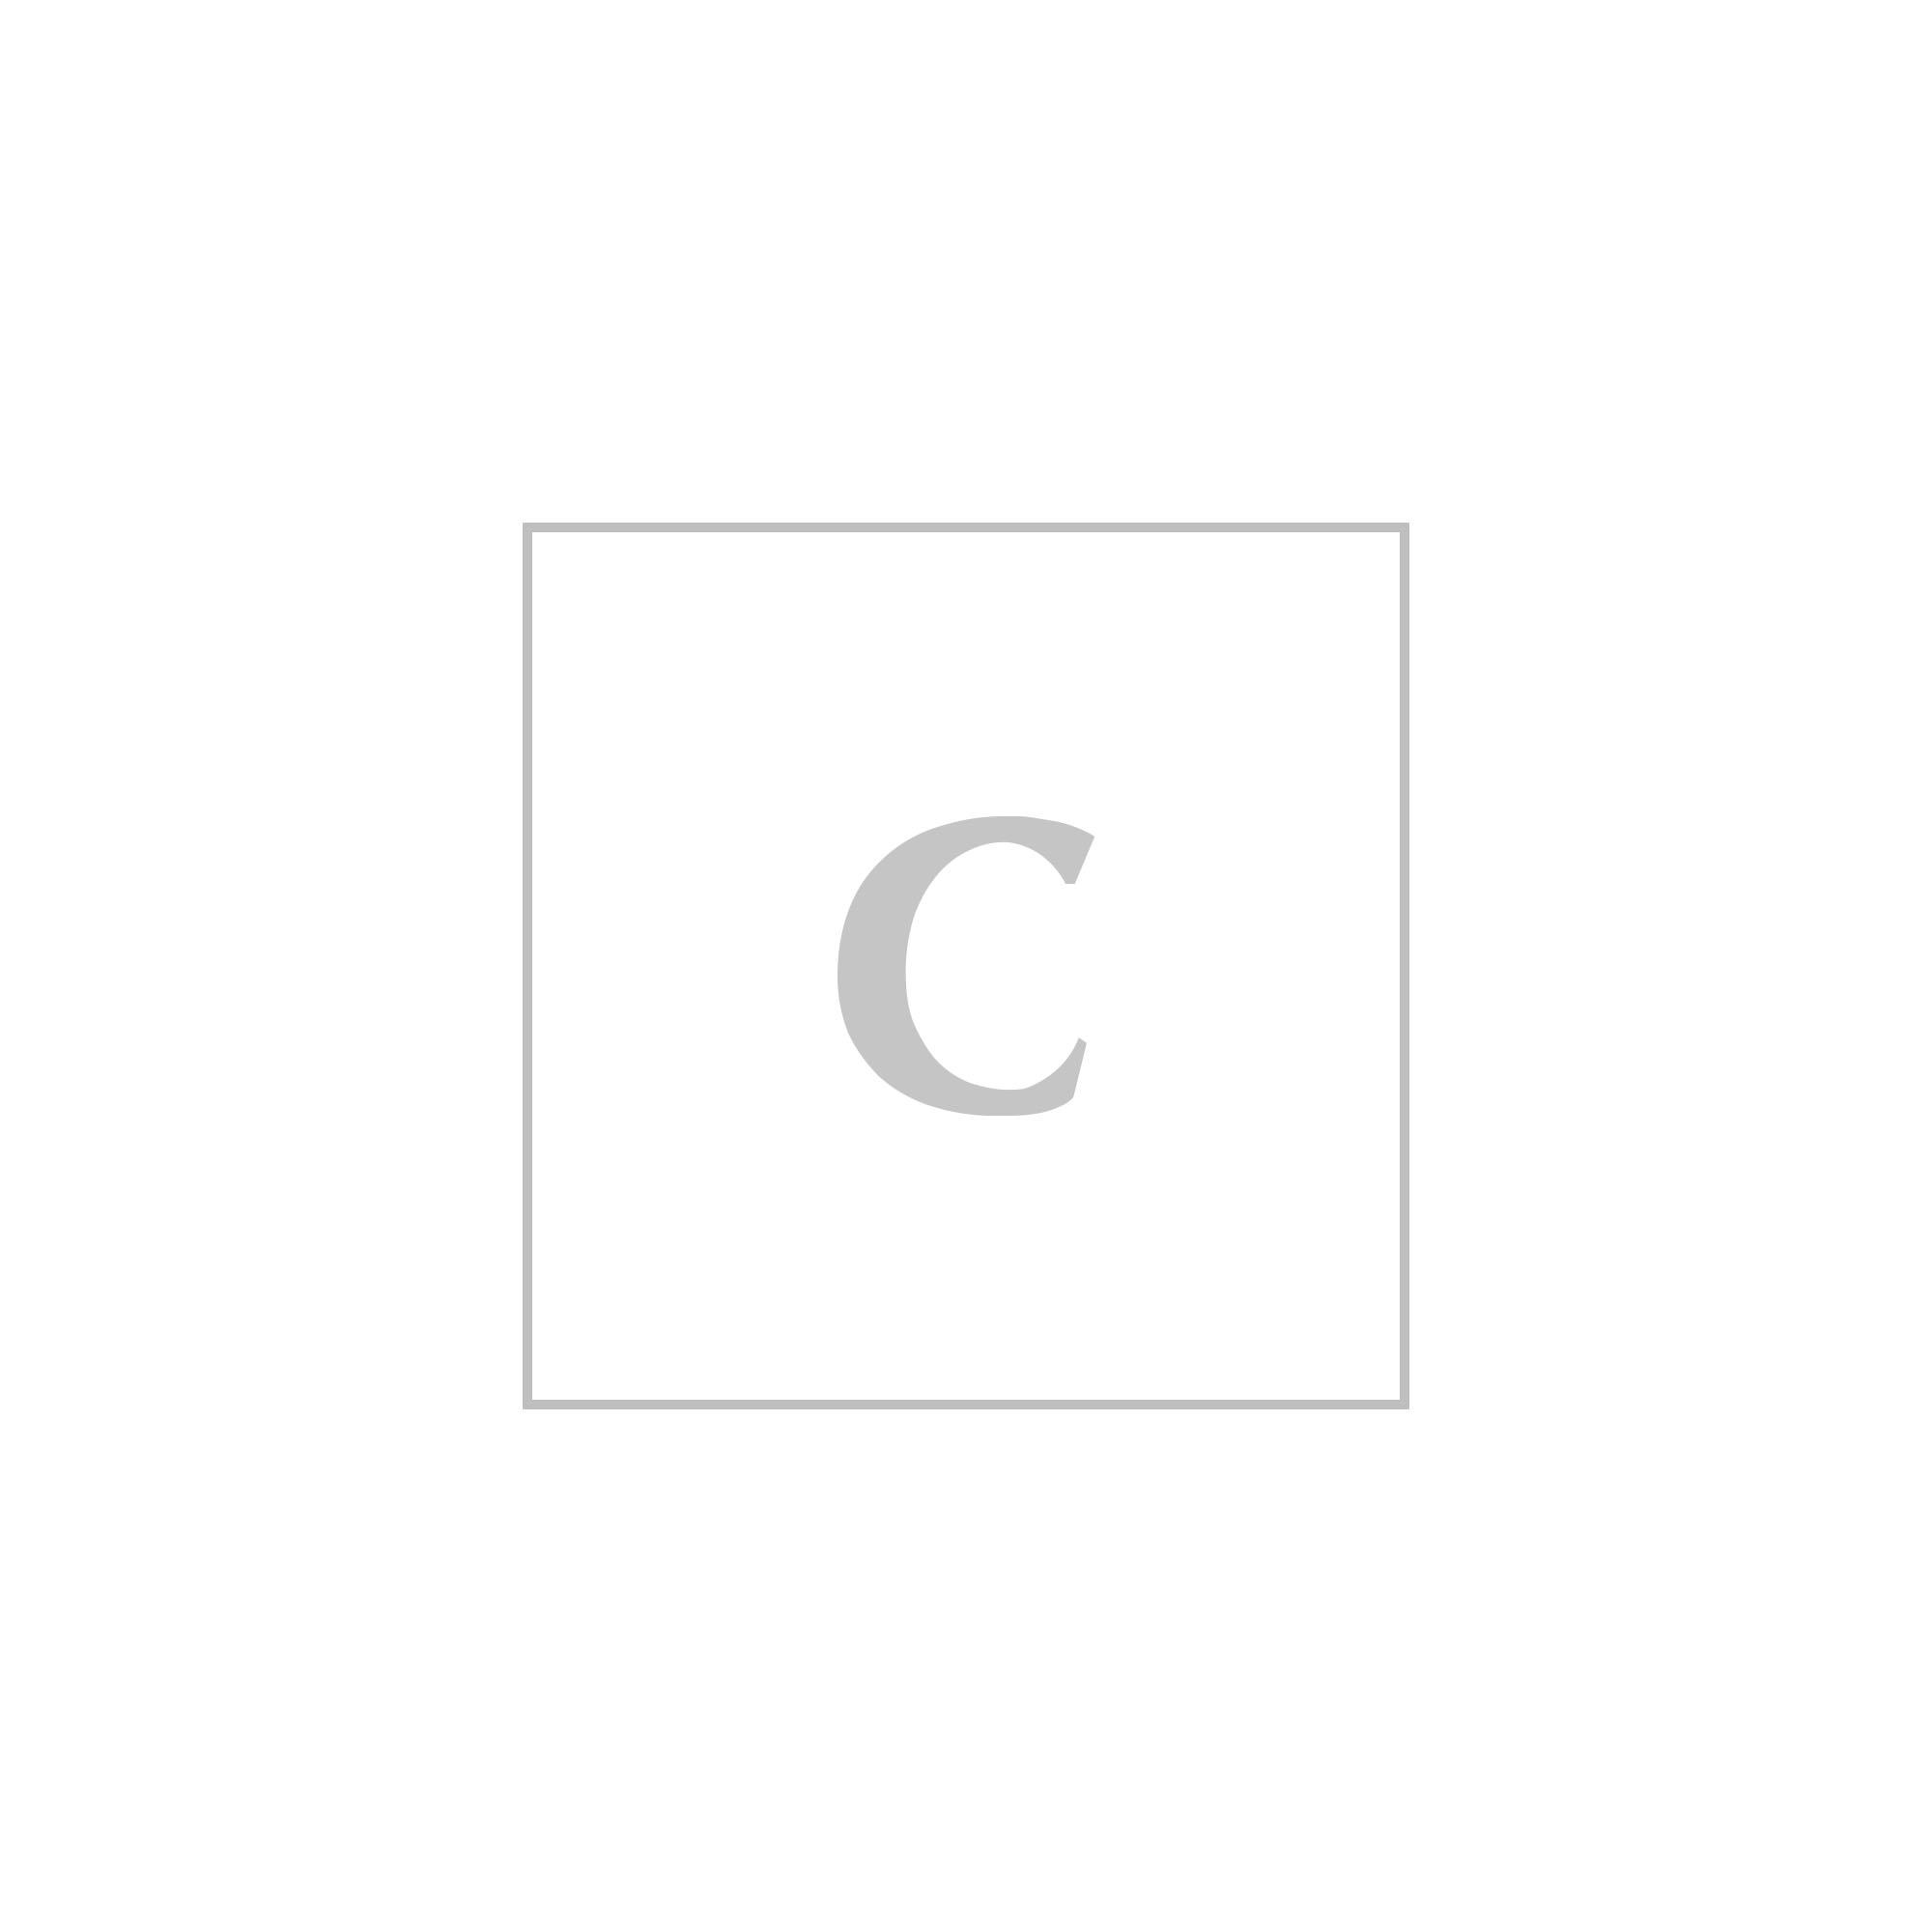 Moncler capsule giubbotto jeremie